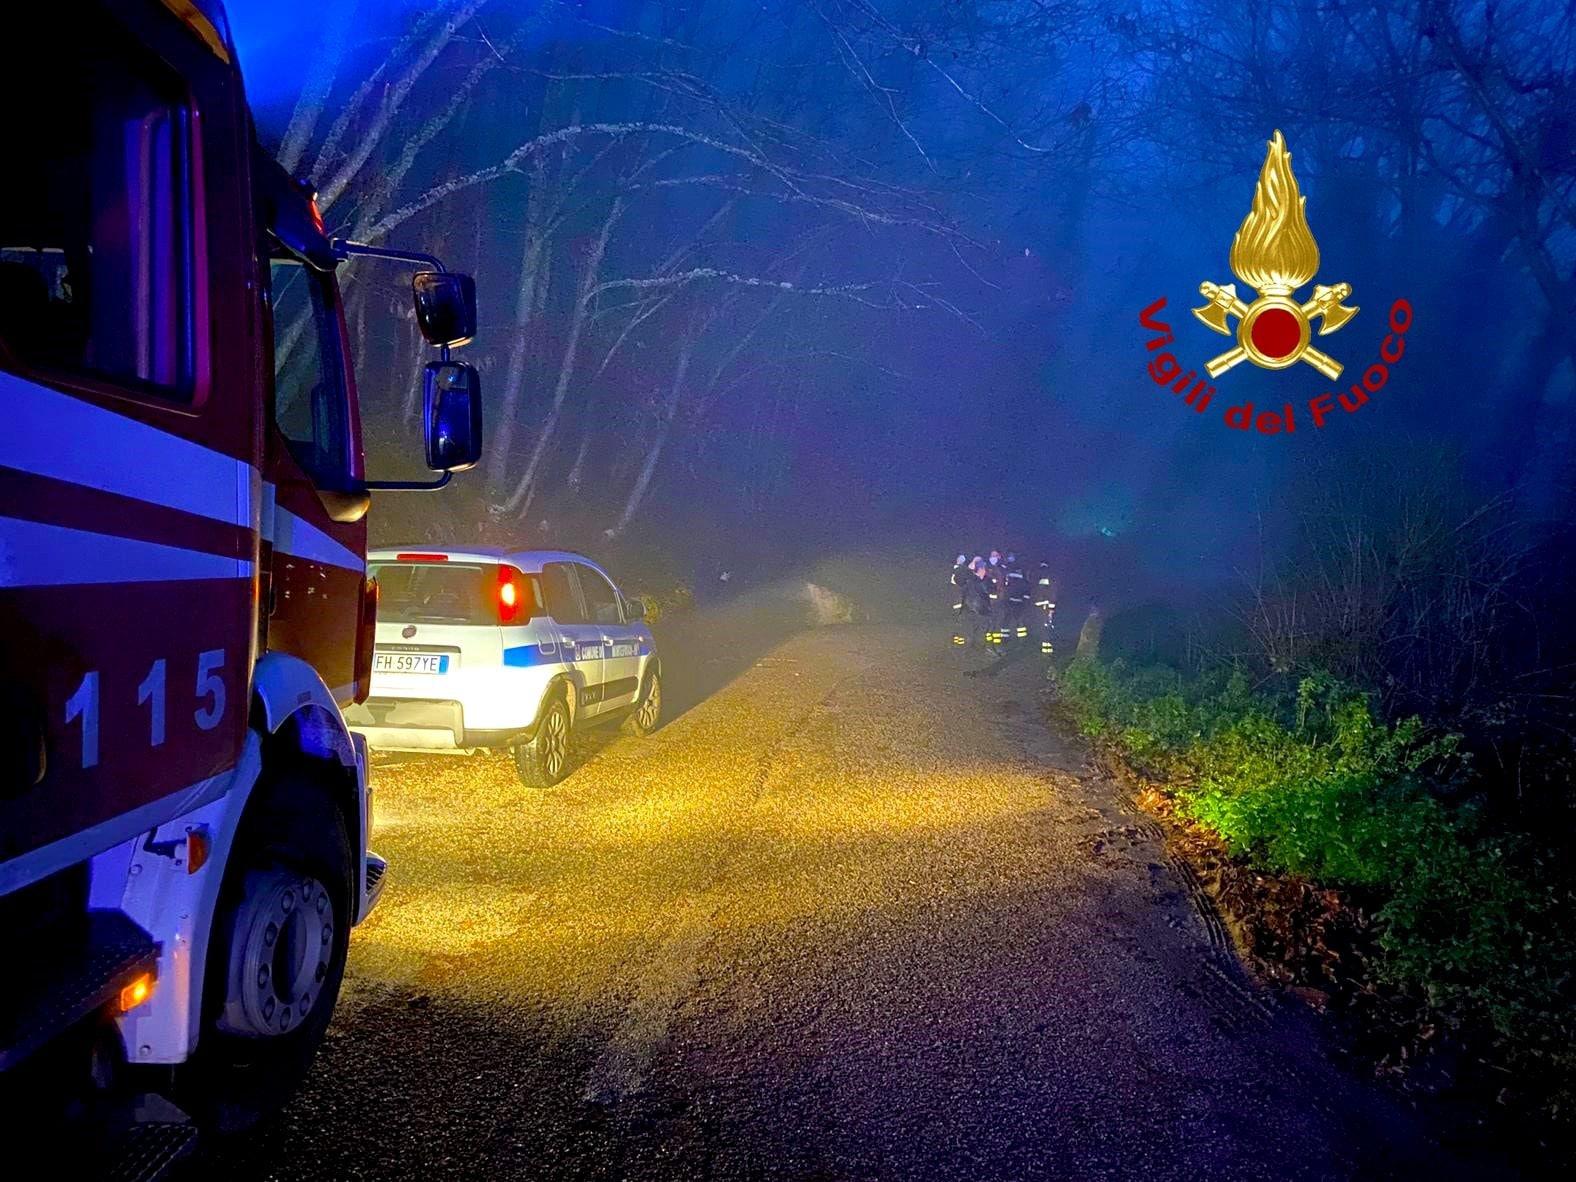 La frana tra Montefusco e Santa Paolina (Avellino)